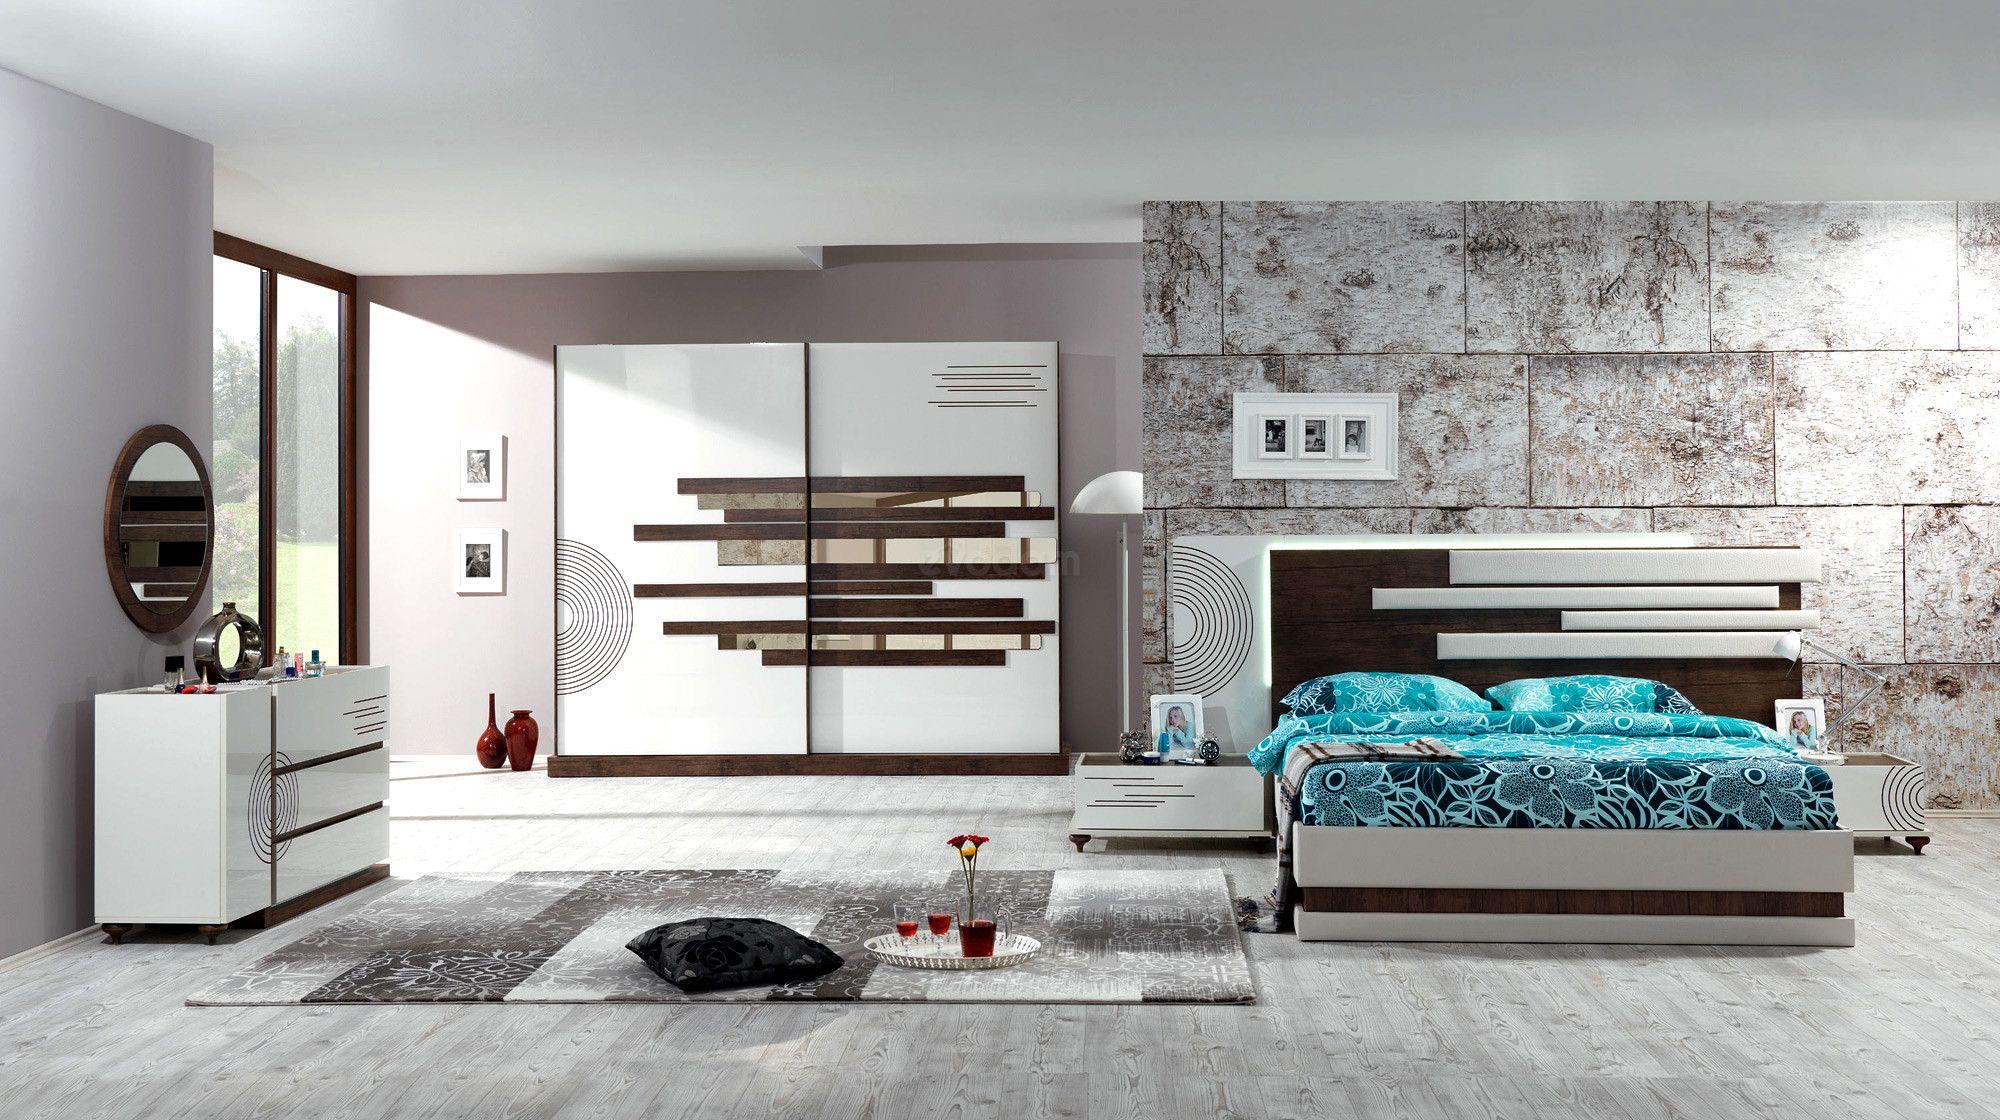 Pin by ashish bansal on ashu chambre - Cheap bedroom furniture sets under 300 ...